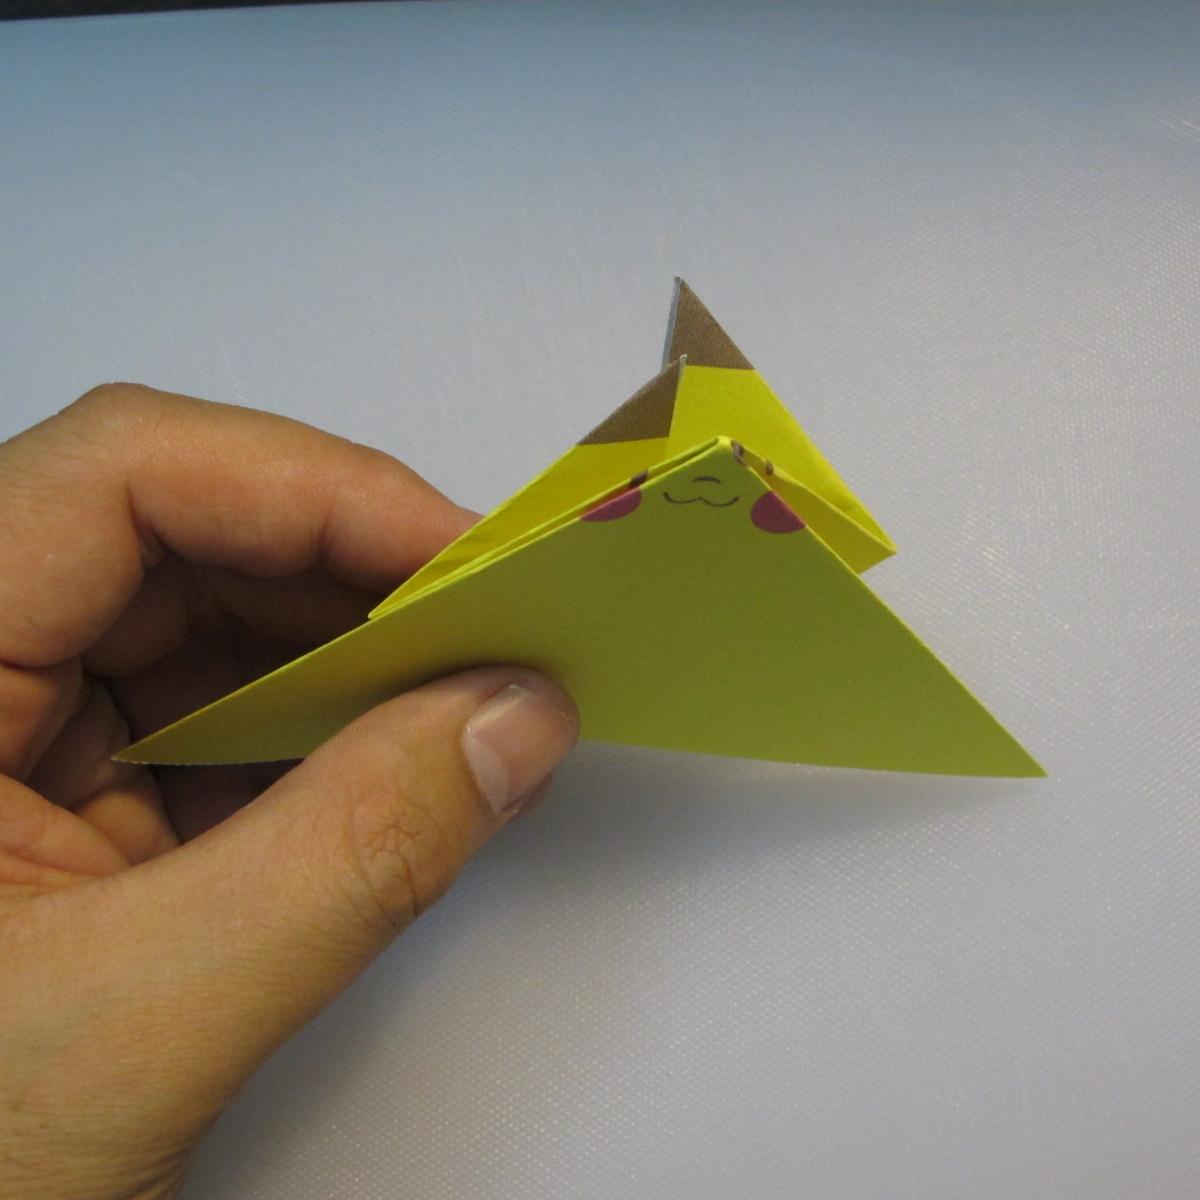 mookeep-วิธีพับกระดาษเป็นรูปปิกาจู-01-008